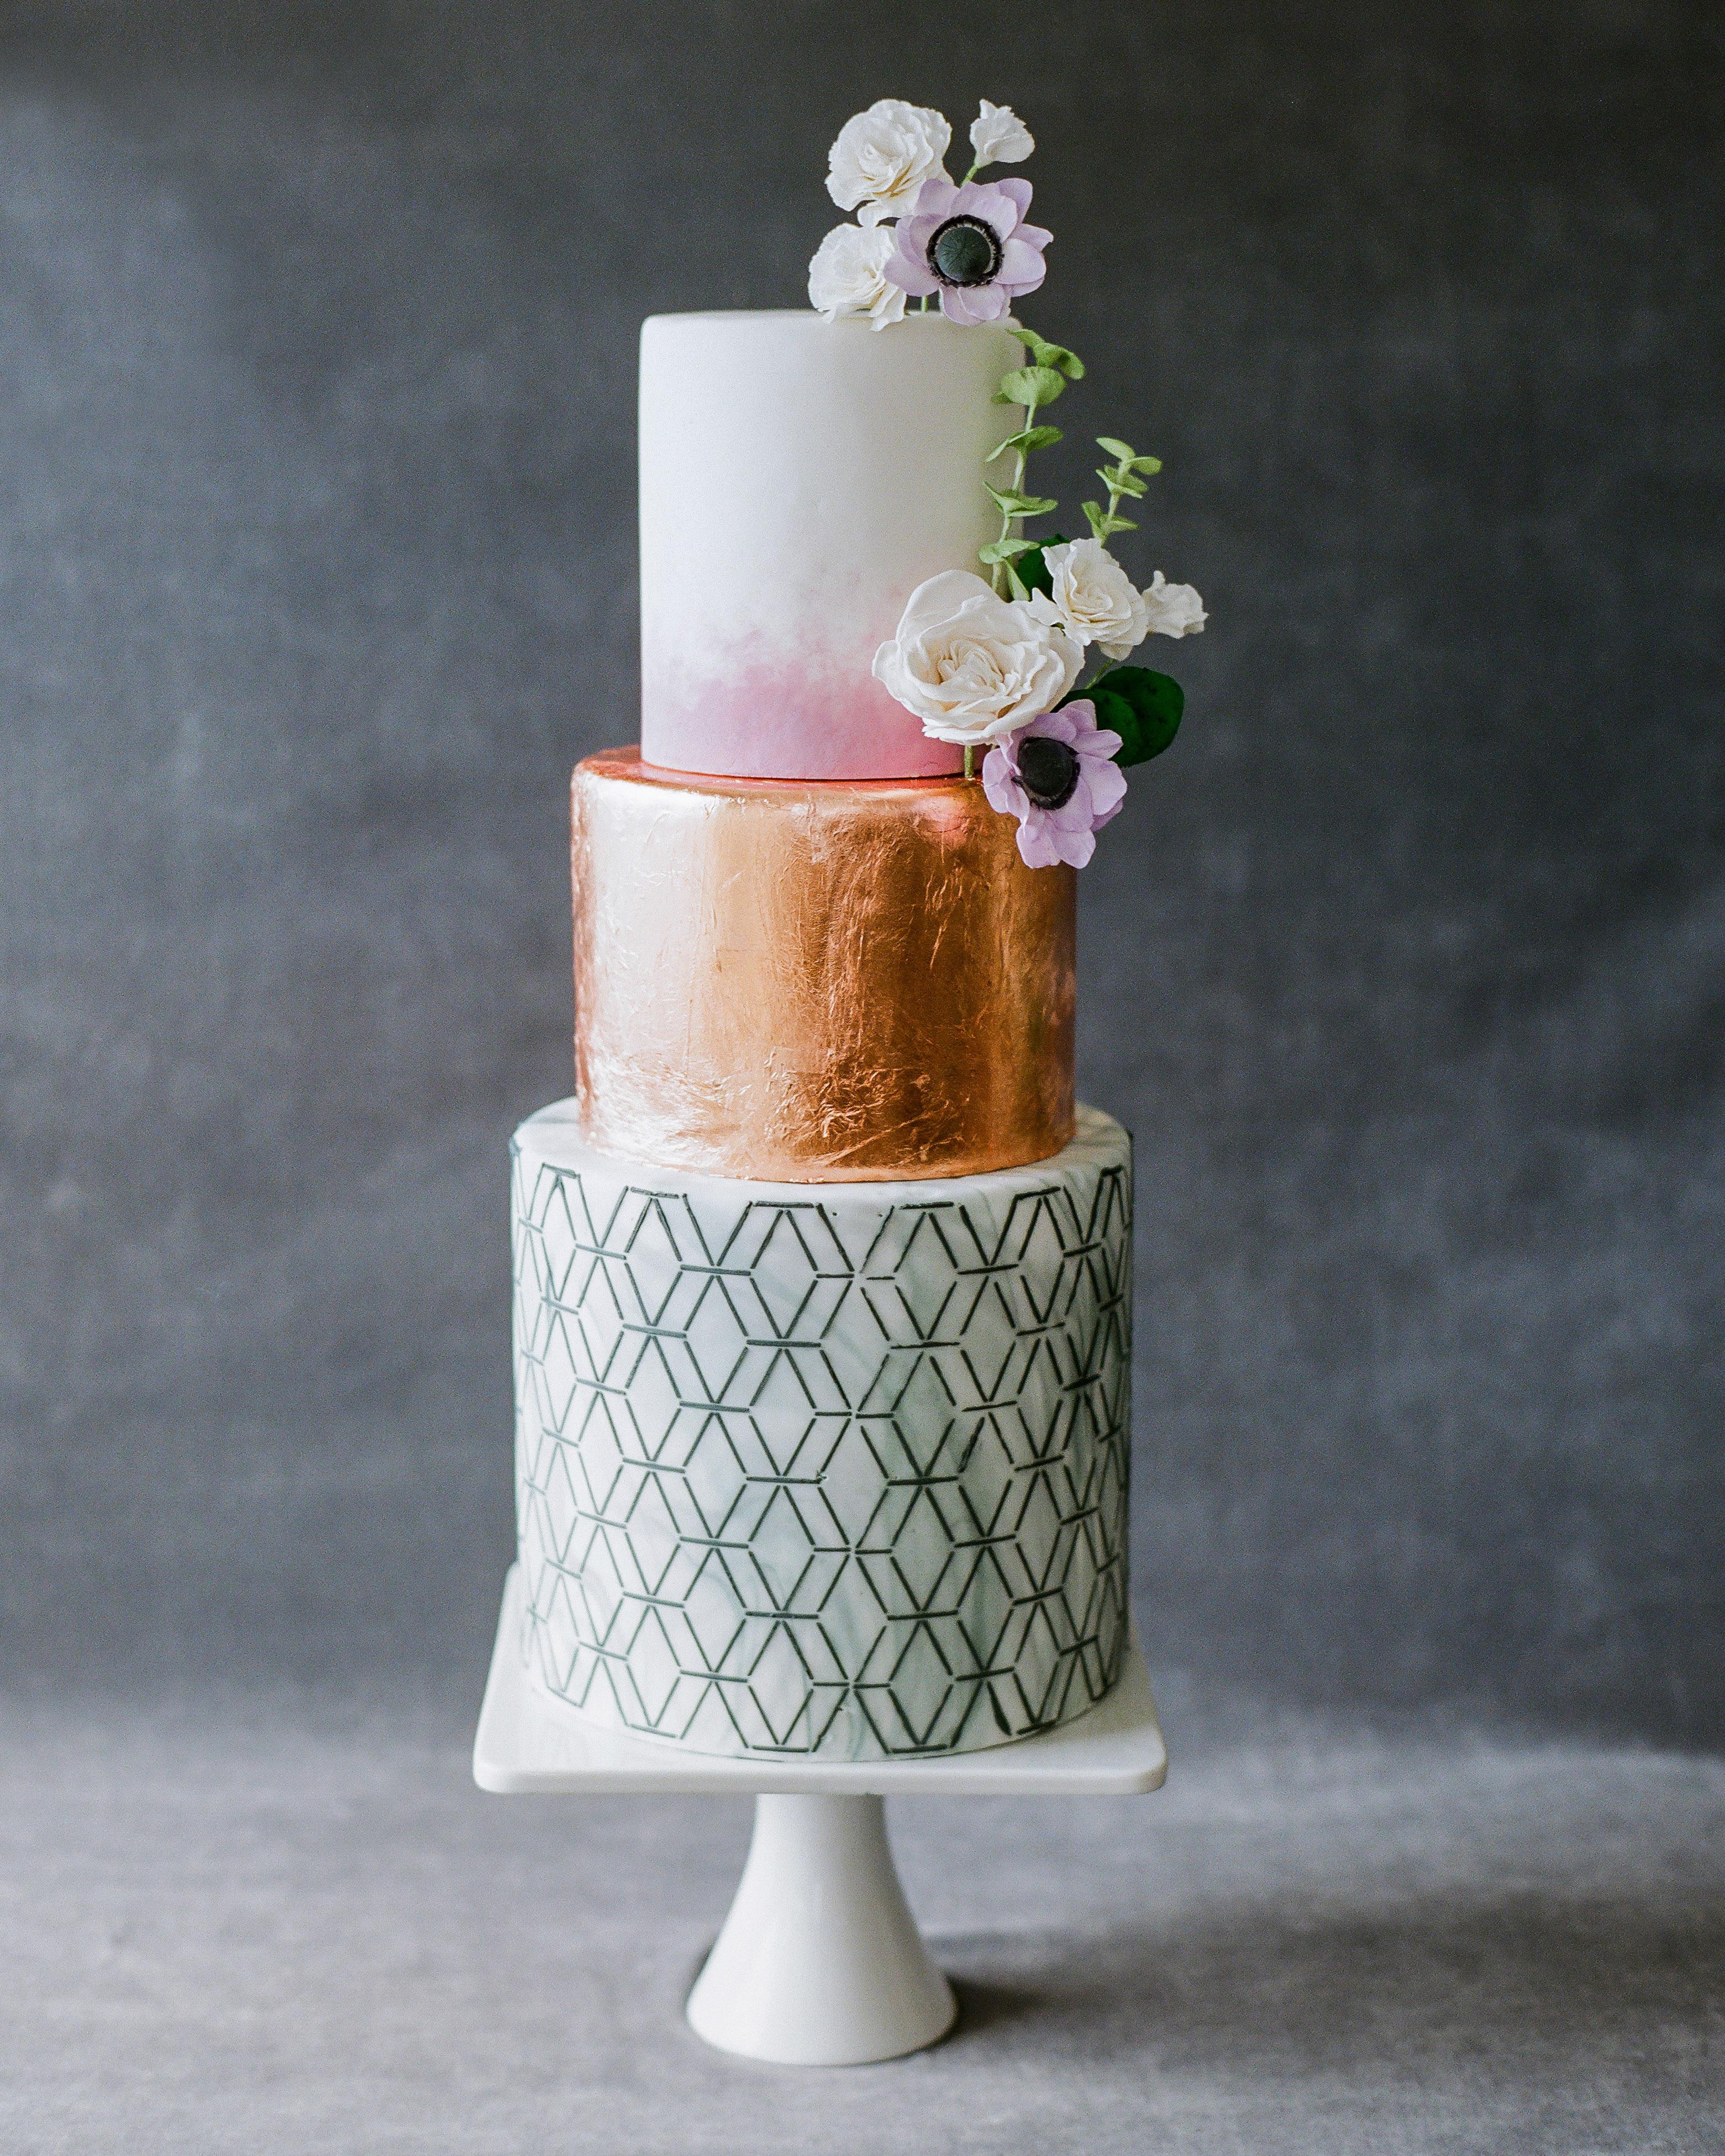 vicky james mexico wedding 3 tiered cake